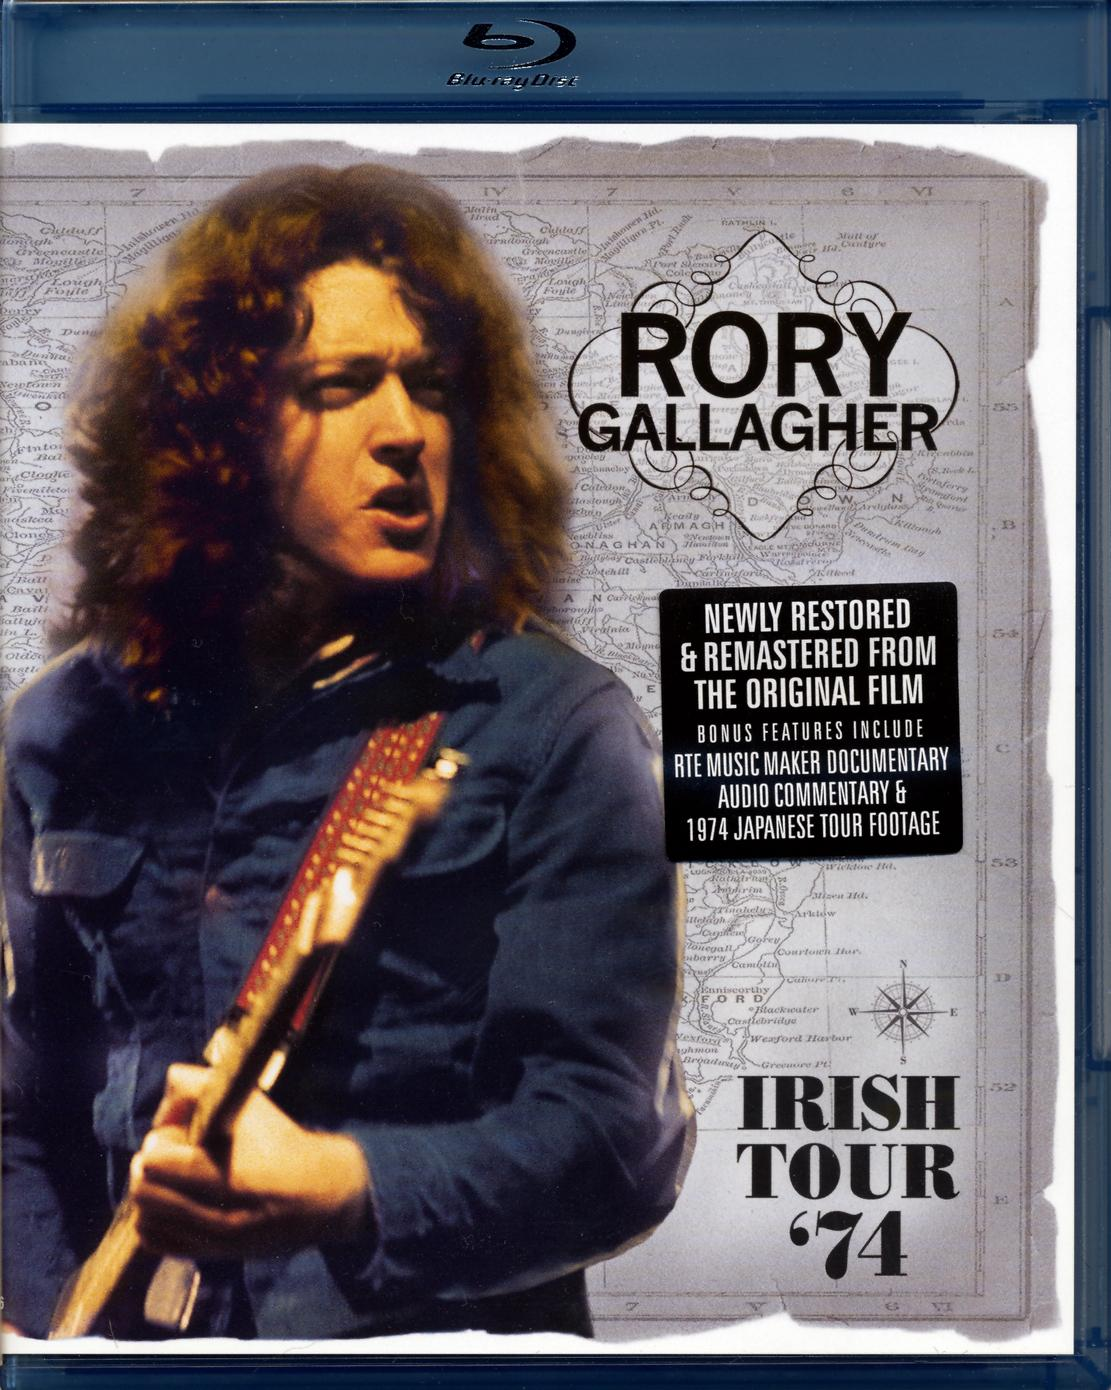 Rory gallagher irish tour 74 rar